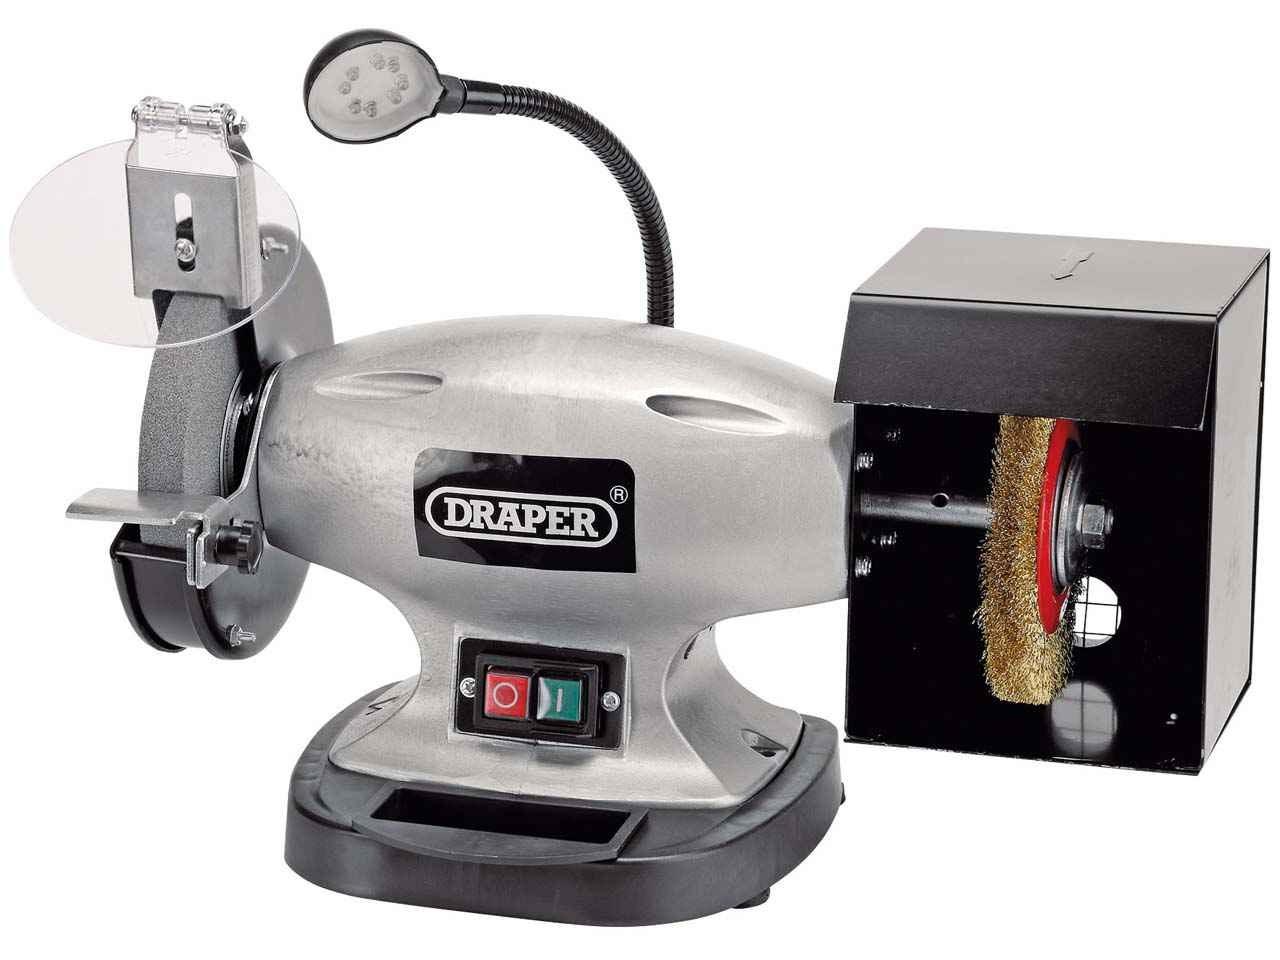 Draper 83421 150mm Bench Grinder with Wire Wheel 370w